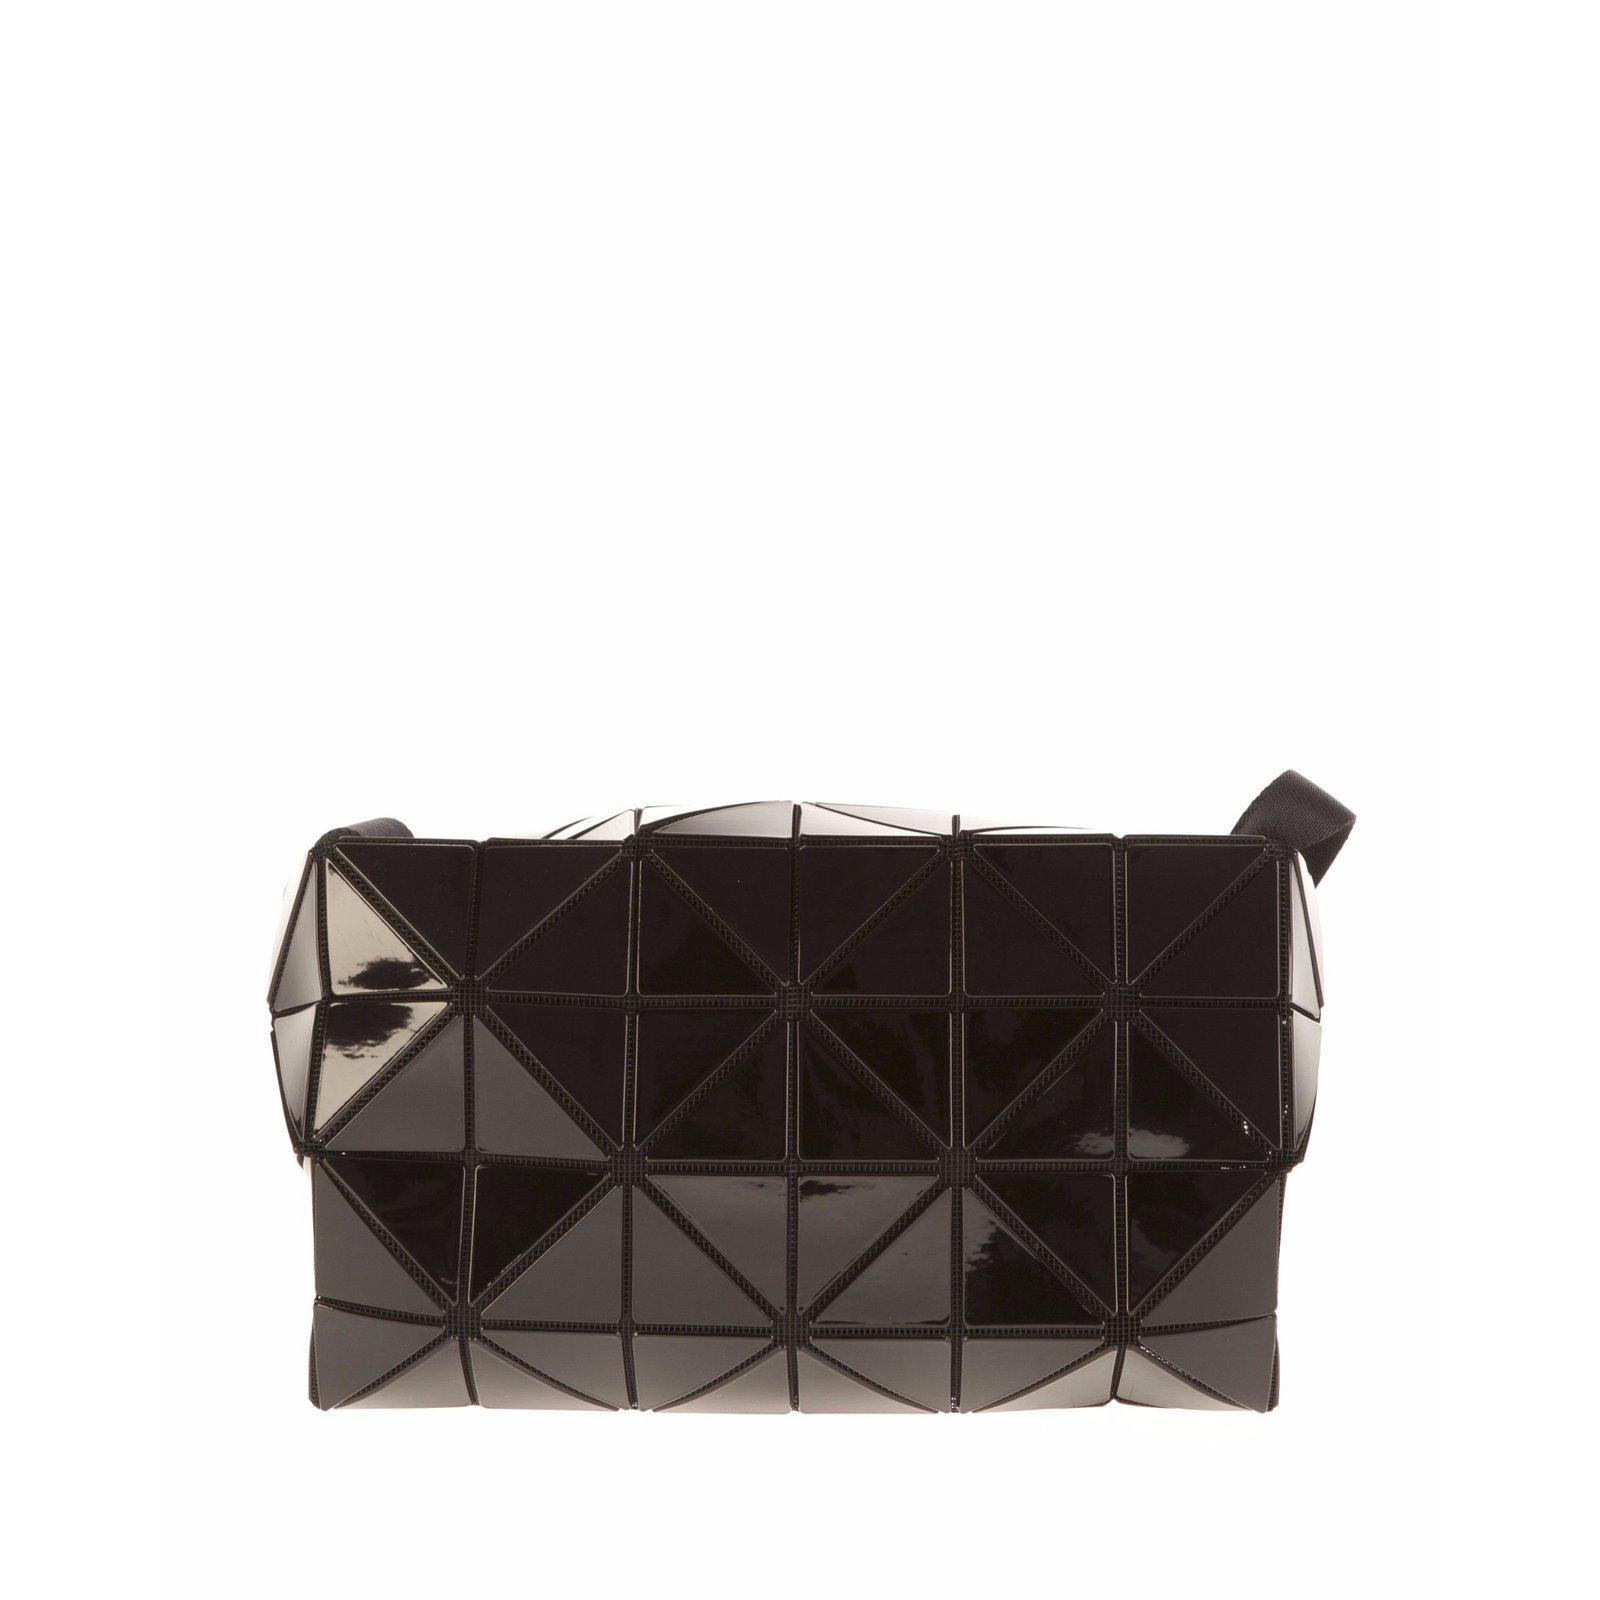 e7f2be4b74 Issey Miyake Baobao issey miyake bag Handbags Polyester Black ref.53738